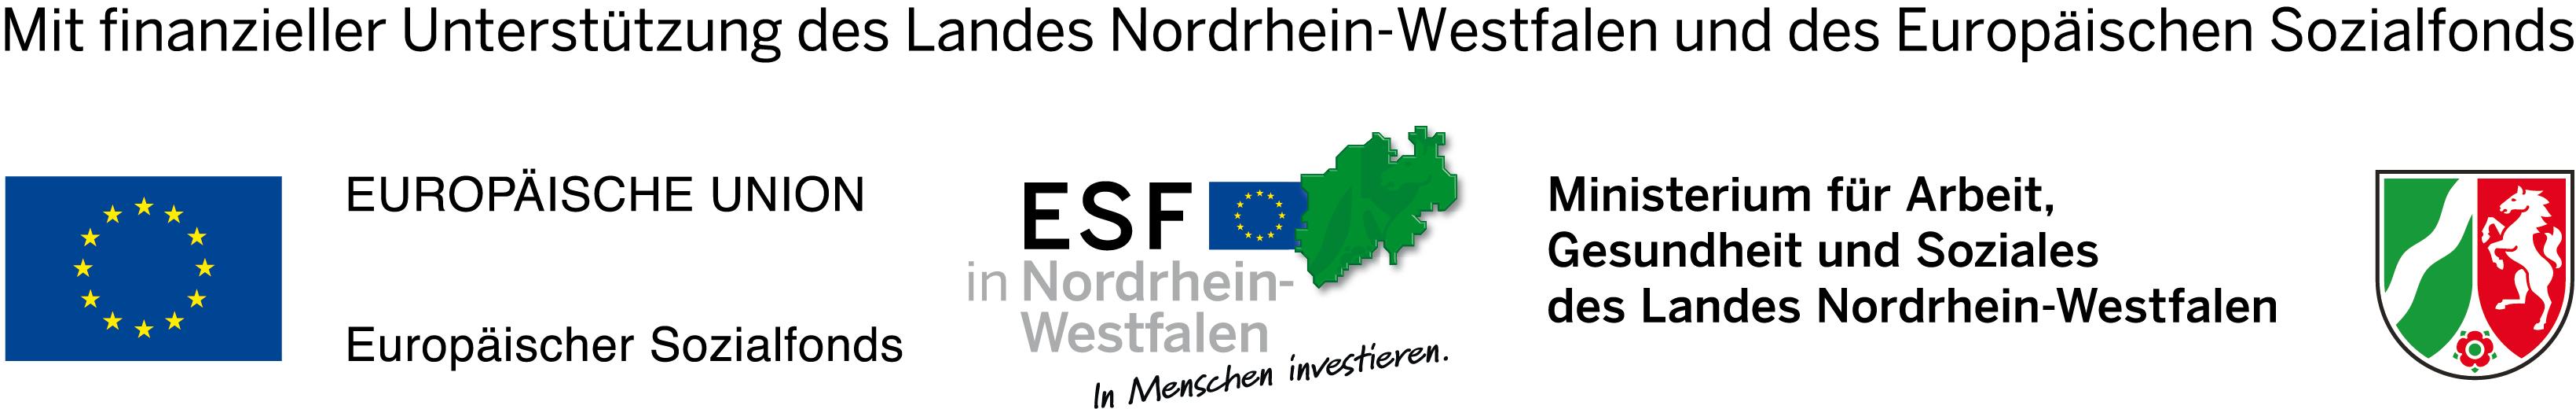 ESF Förderung in NRW